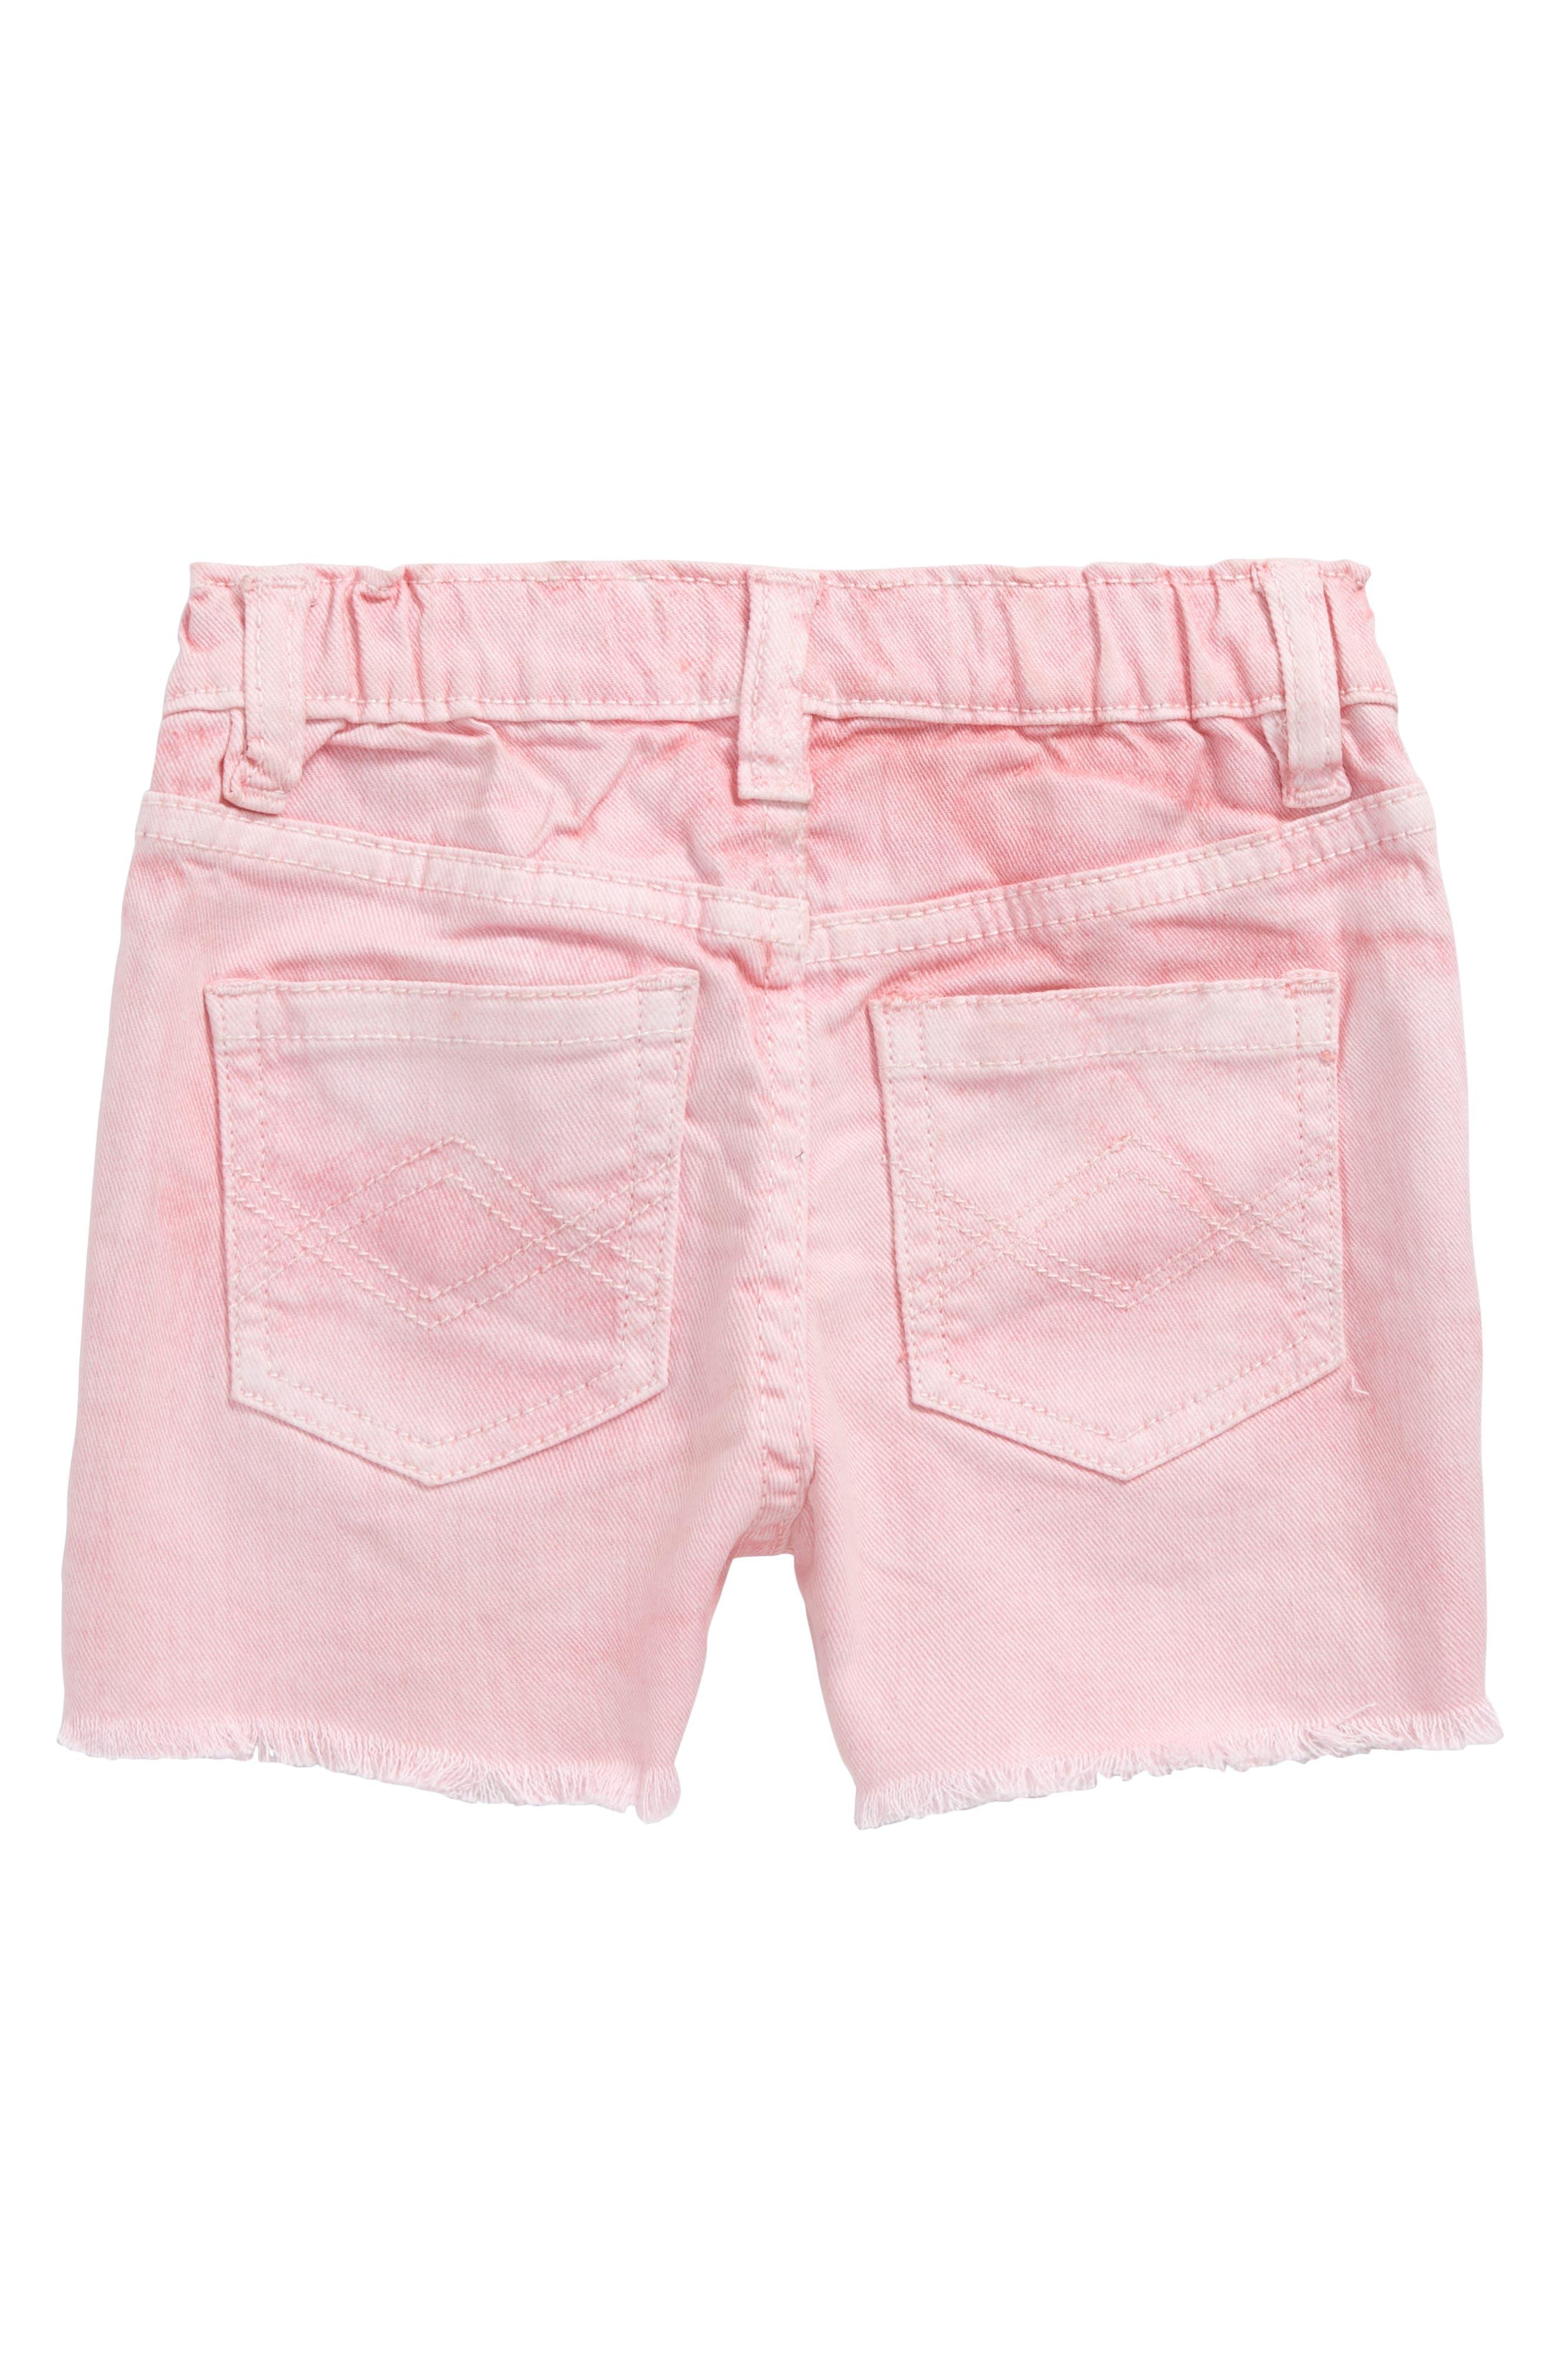 Griffin Cutoff Denim Shorts,                             Alternate thumbnail 2, color,                             Pink